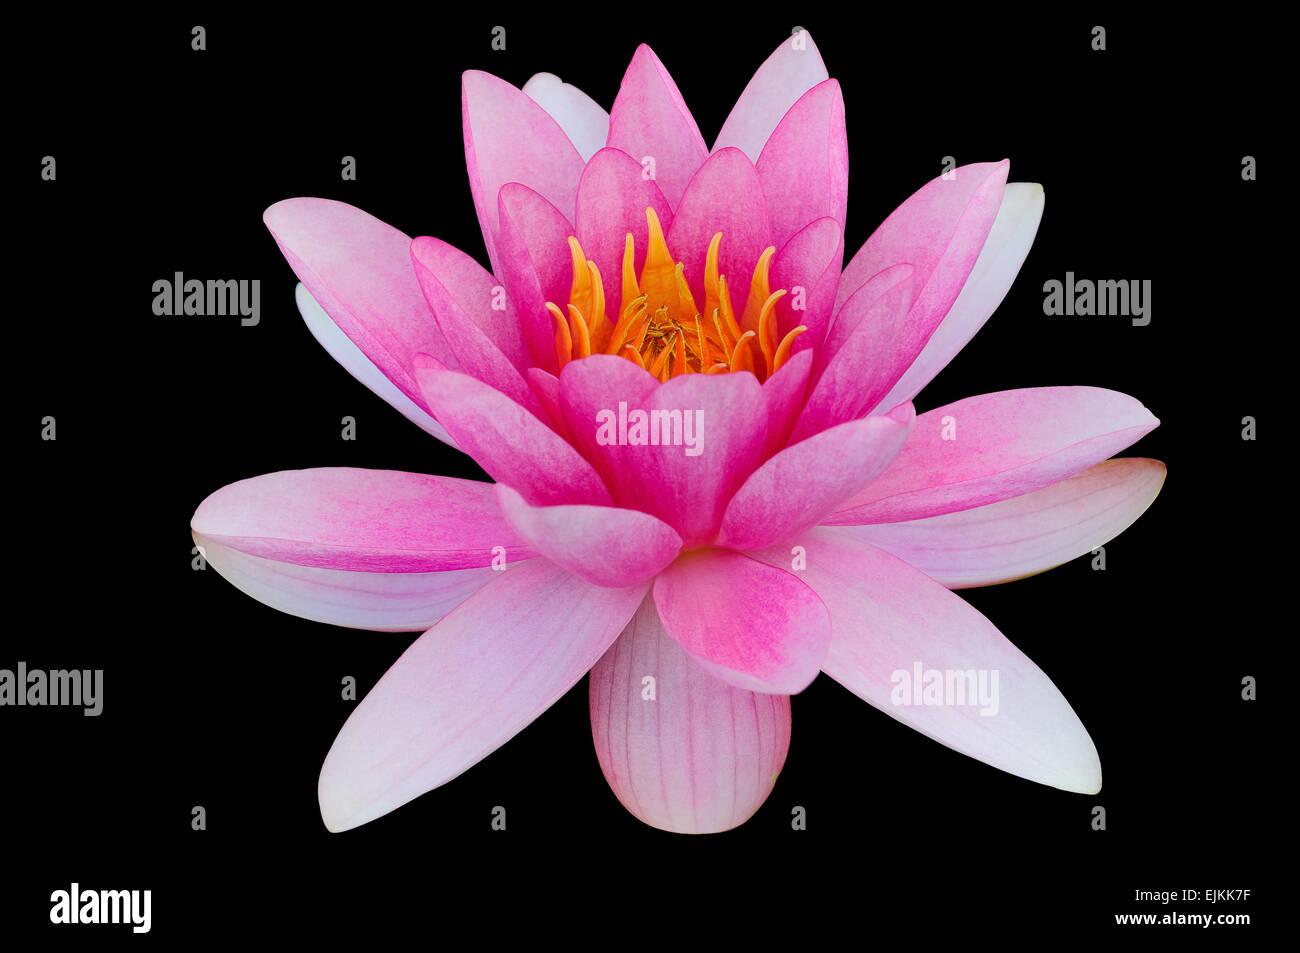 Rosa Seerose schwarzen Hintergrund Clip Art Clipping-Pfad Stockbild